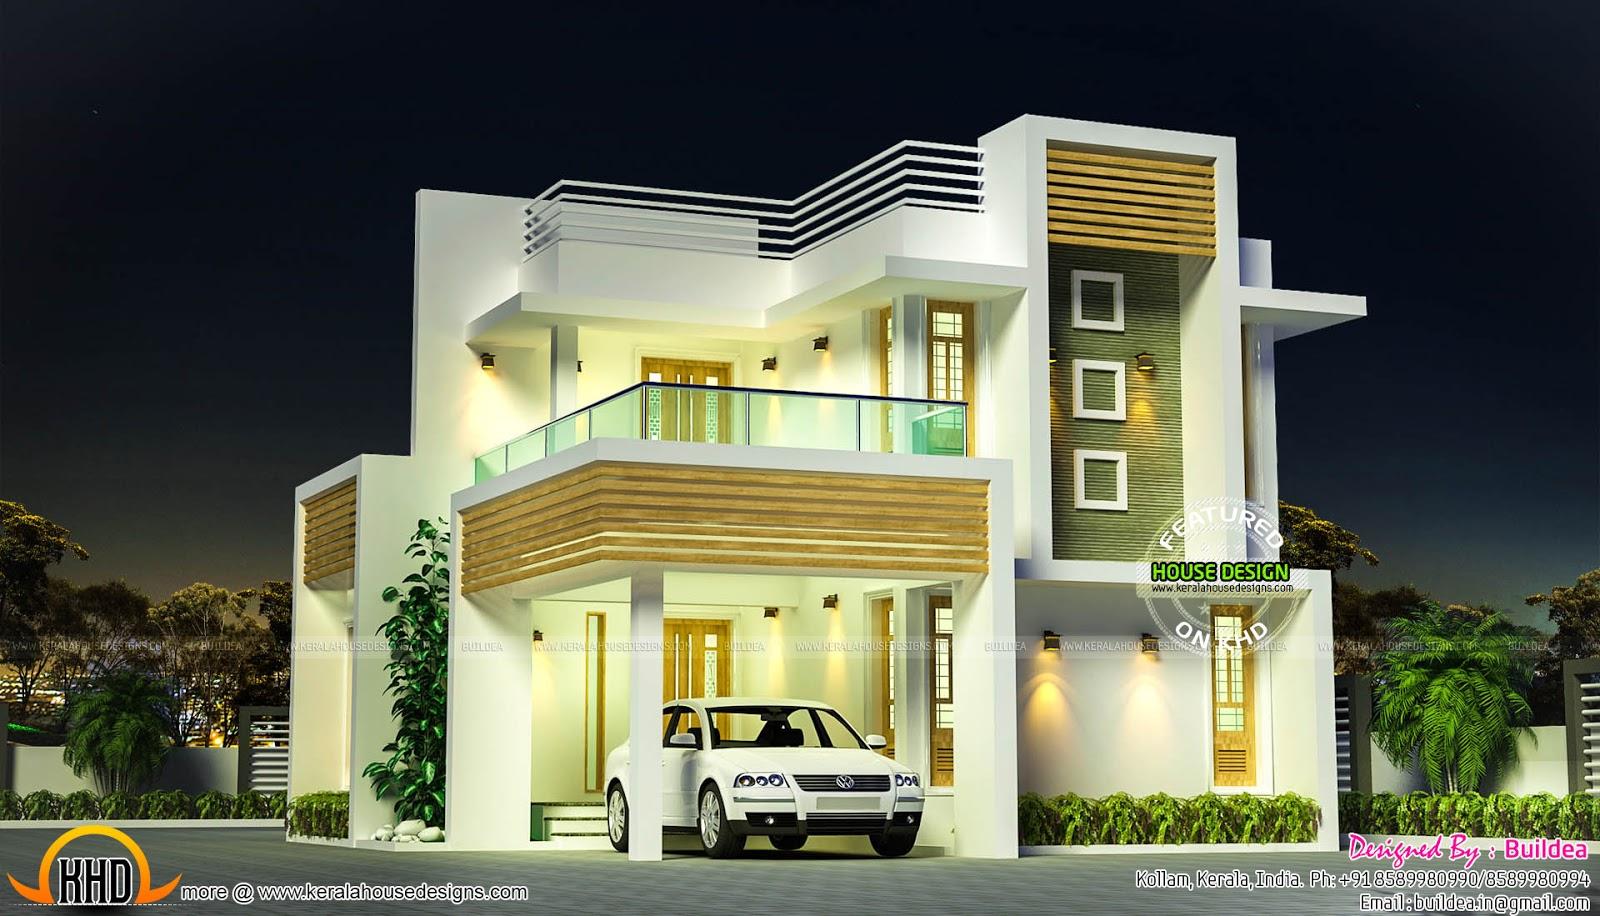 Elegant small contemporaryhome Kerala home design and